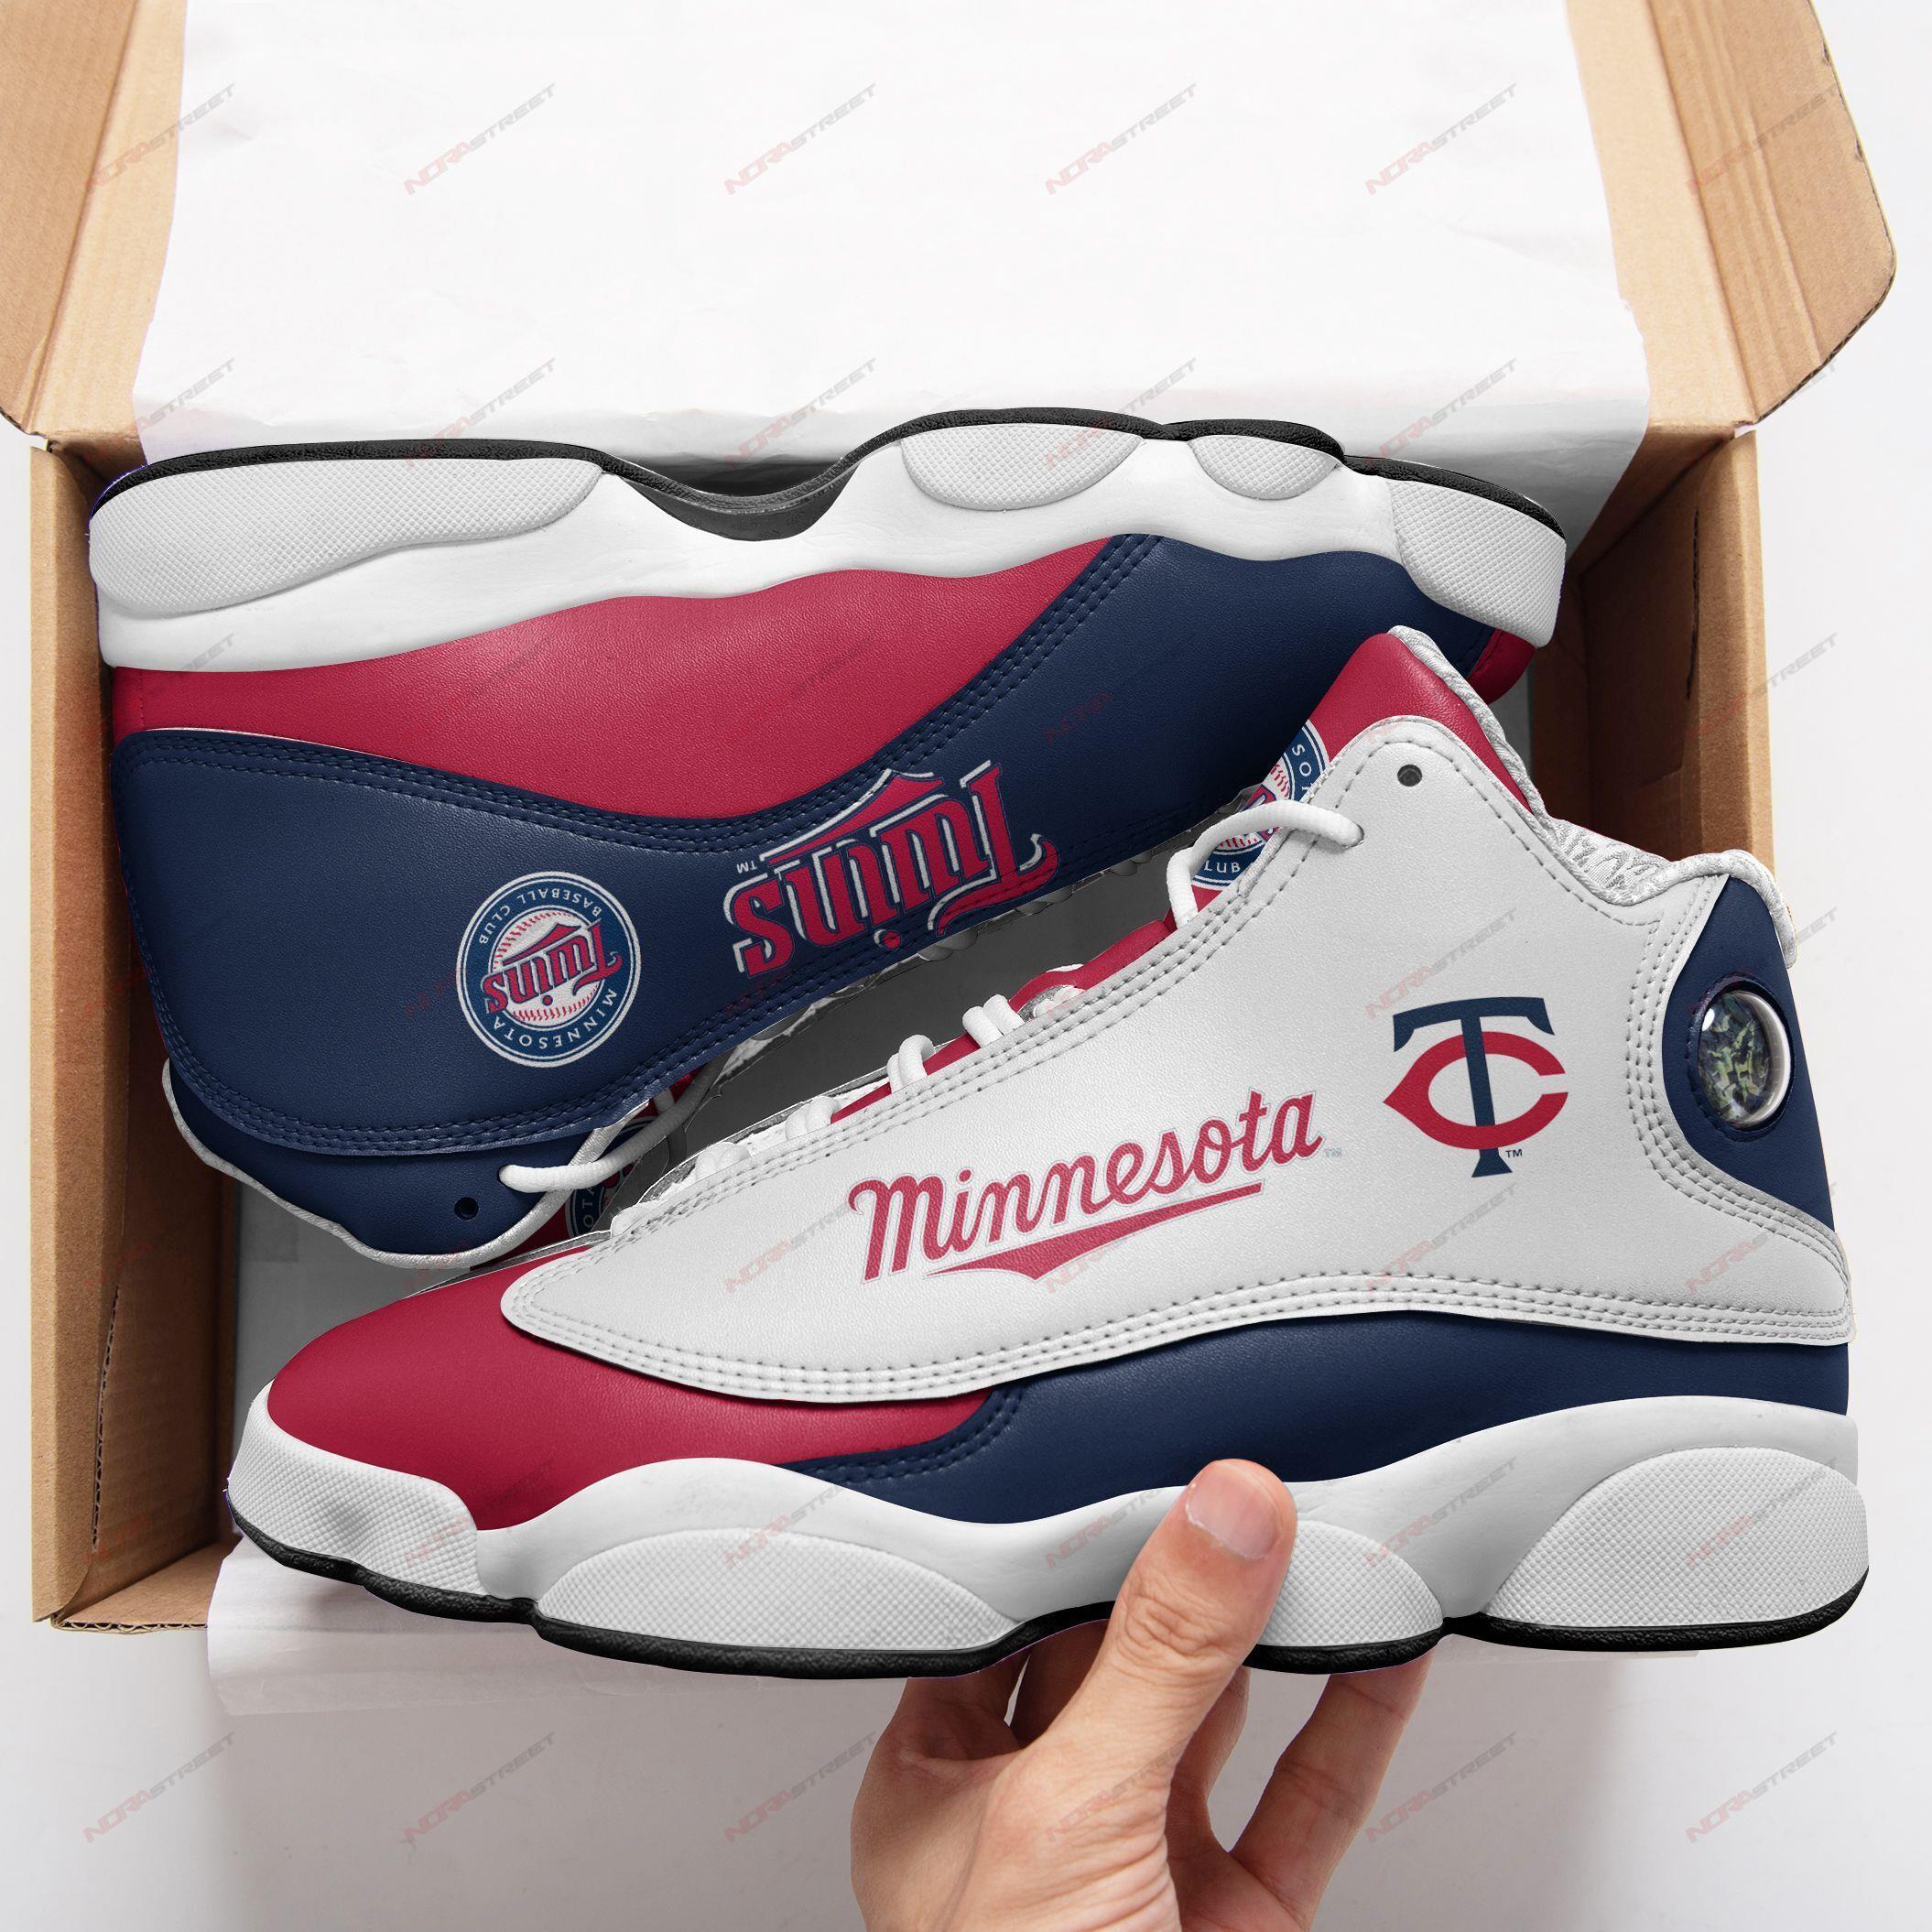 Minnesota Twins Air Jordan 13 Sneakers Sport Shoes Full Size